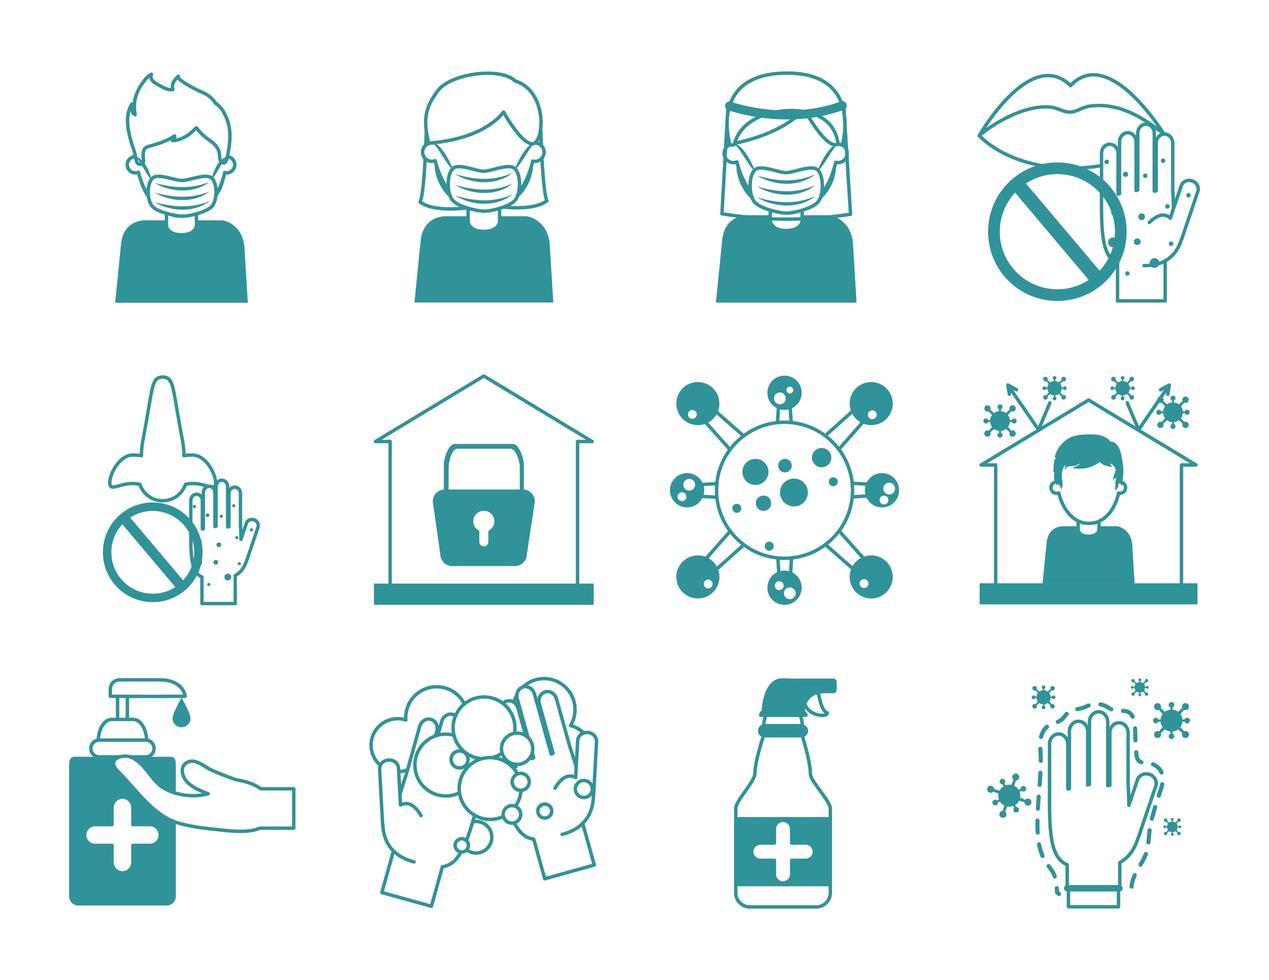 Coronavirus pandemic prevention icon set vector